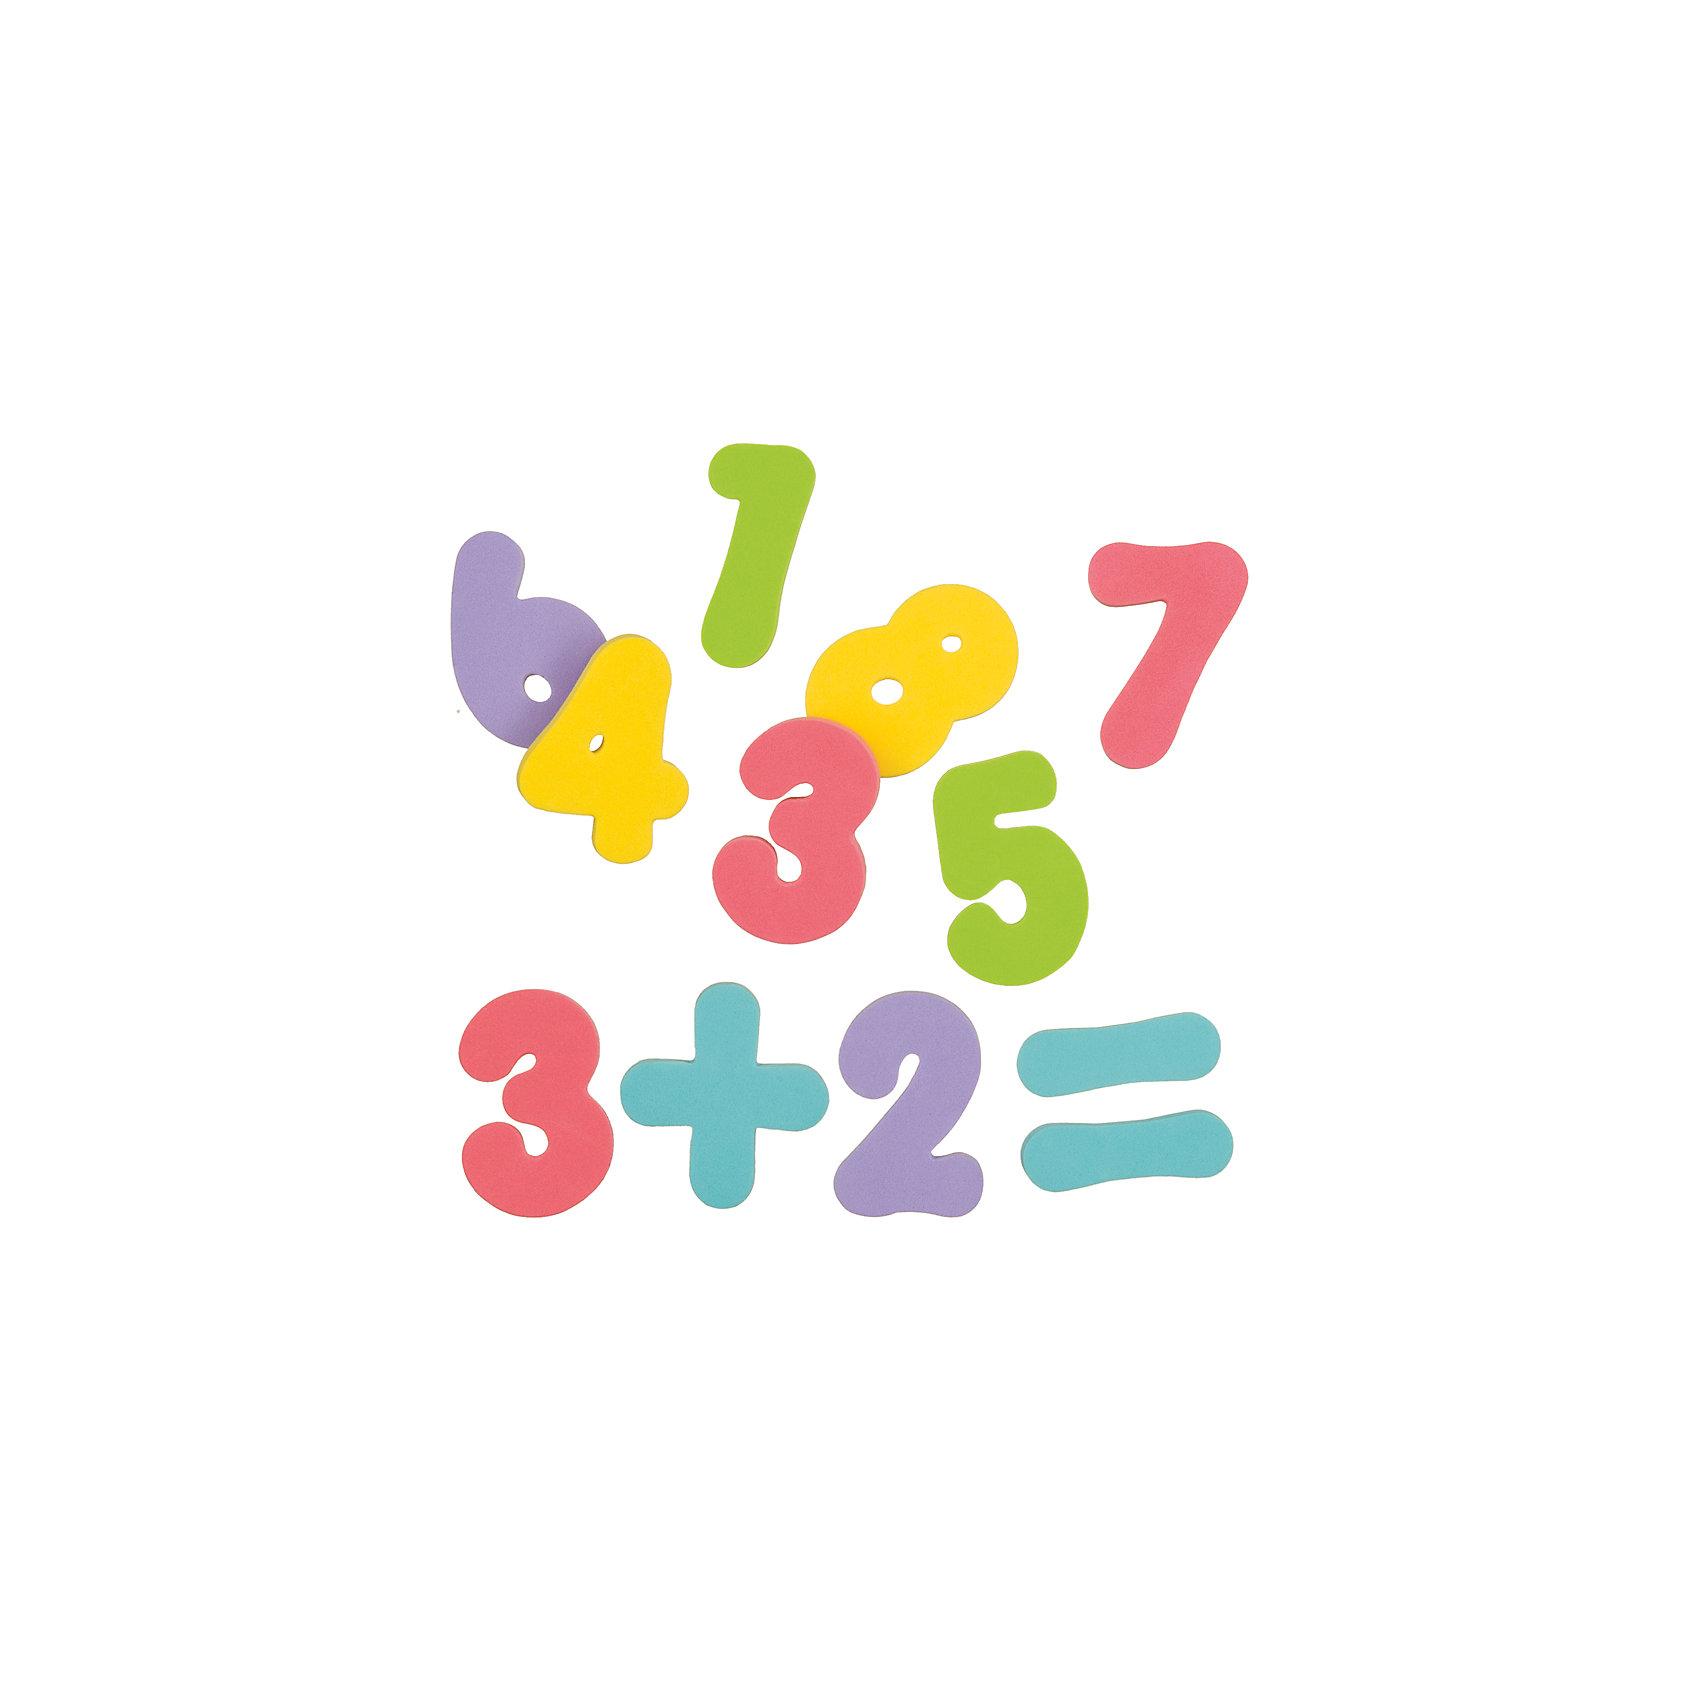 Набор игрушек для ванной GENIUS, Happy BabyИгрушки для ванной<br><br><br>Ширина мм: 6<br>Глубина мм: 235<br>Высота мм: 27<br>Вес г: 91<br>Возраст от месяцев: 12<br>Возраст до месяцев: 36<br>Пол: Унисекс<br>Возраст: Детский<br>SKU: 5345702